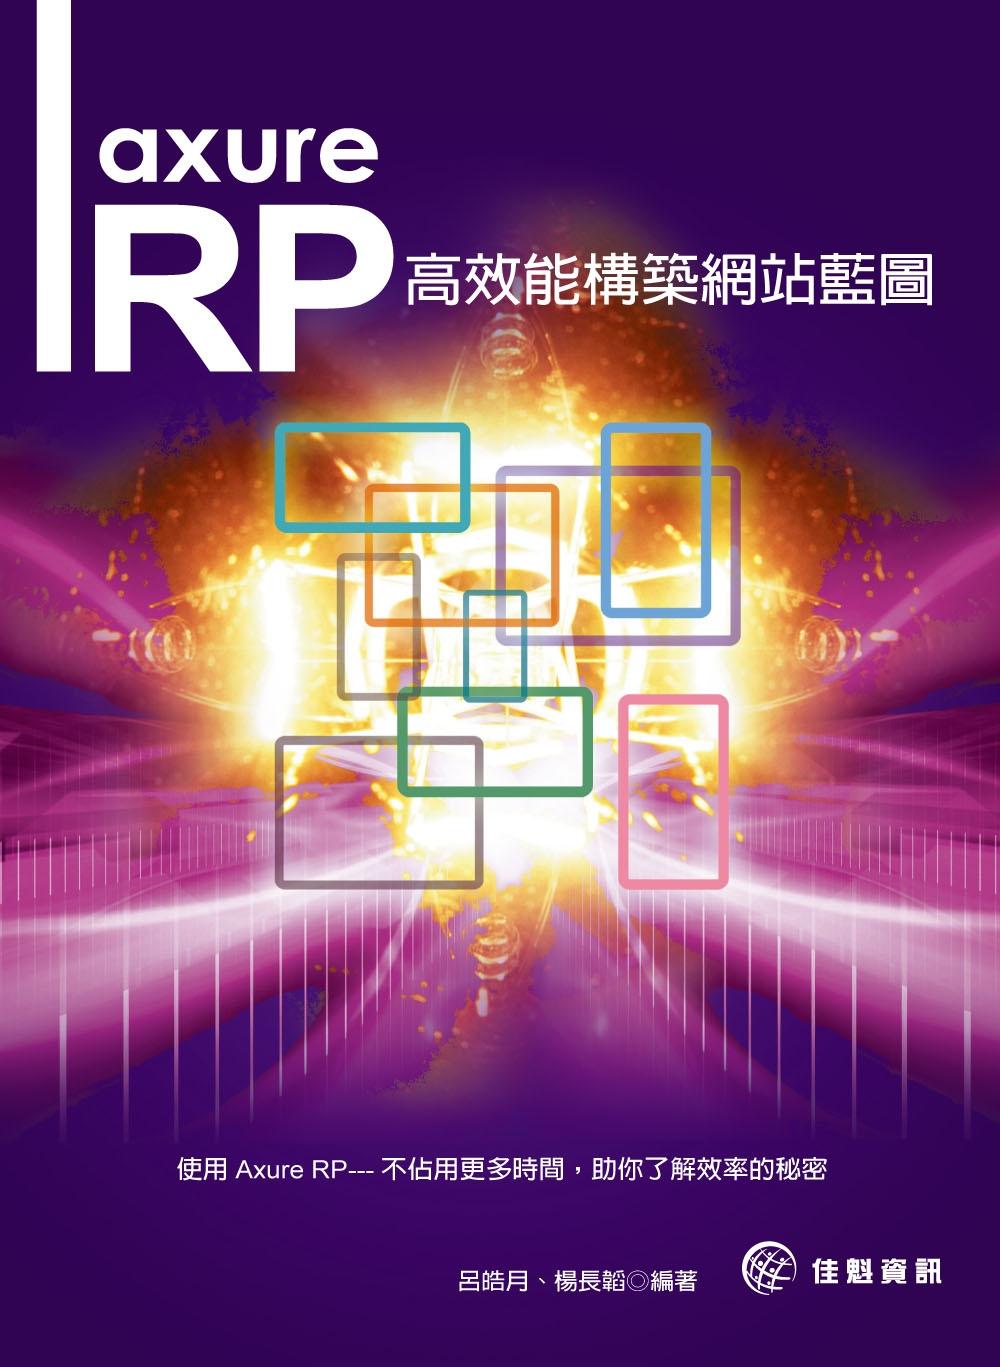 Axure RP:高效能構築網站藍圖